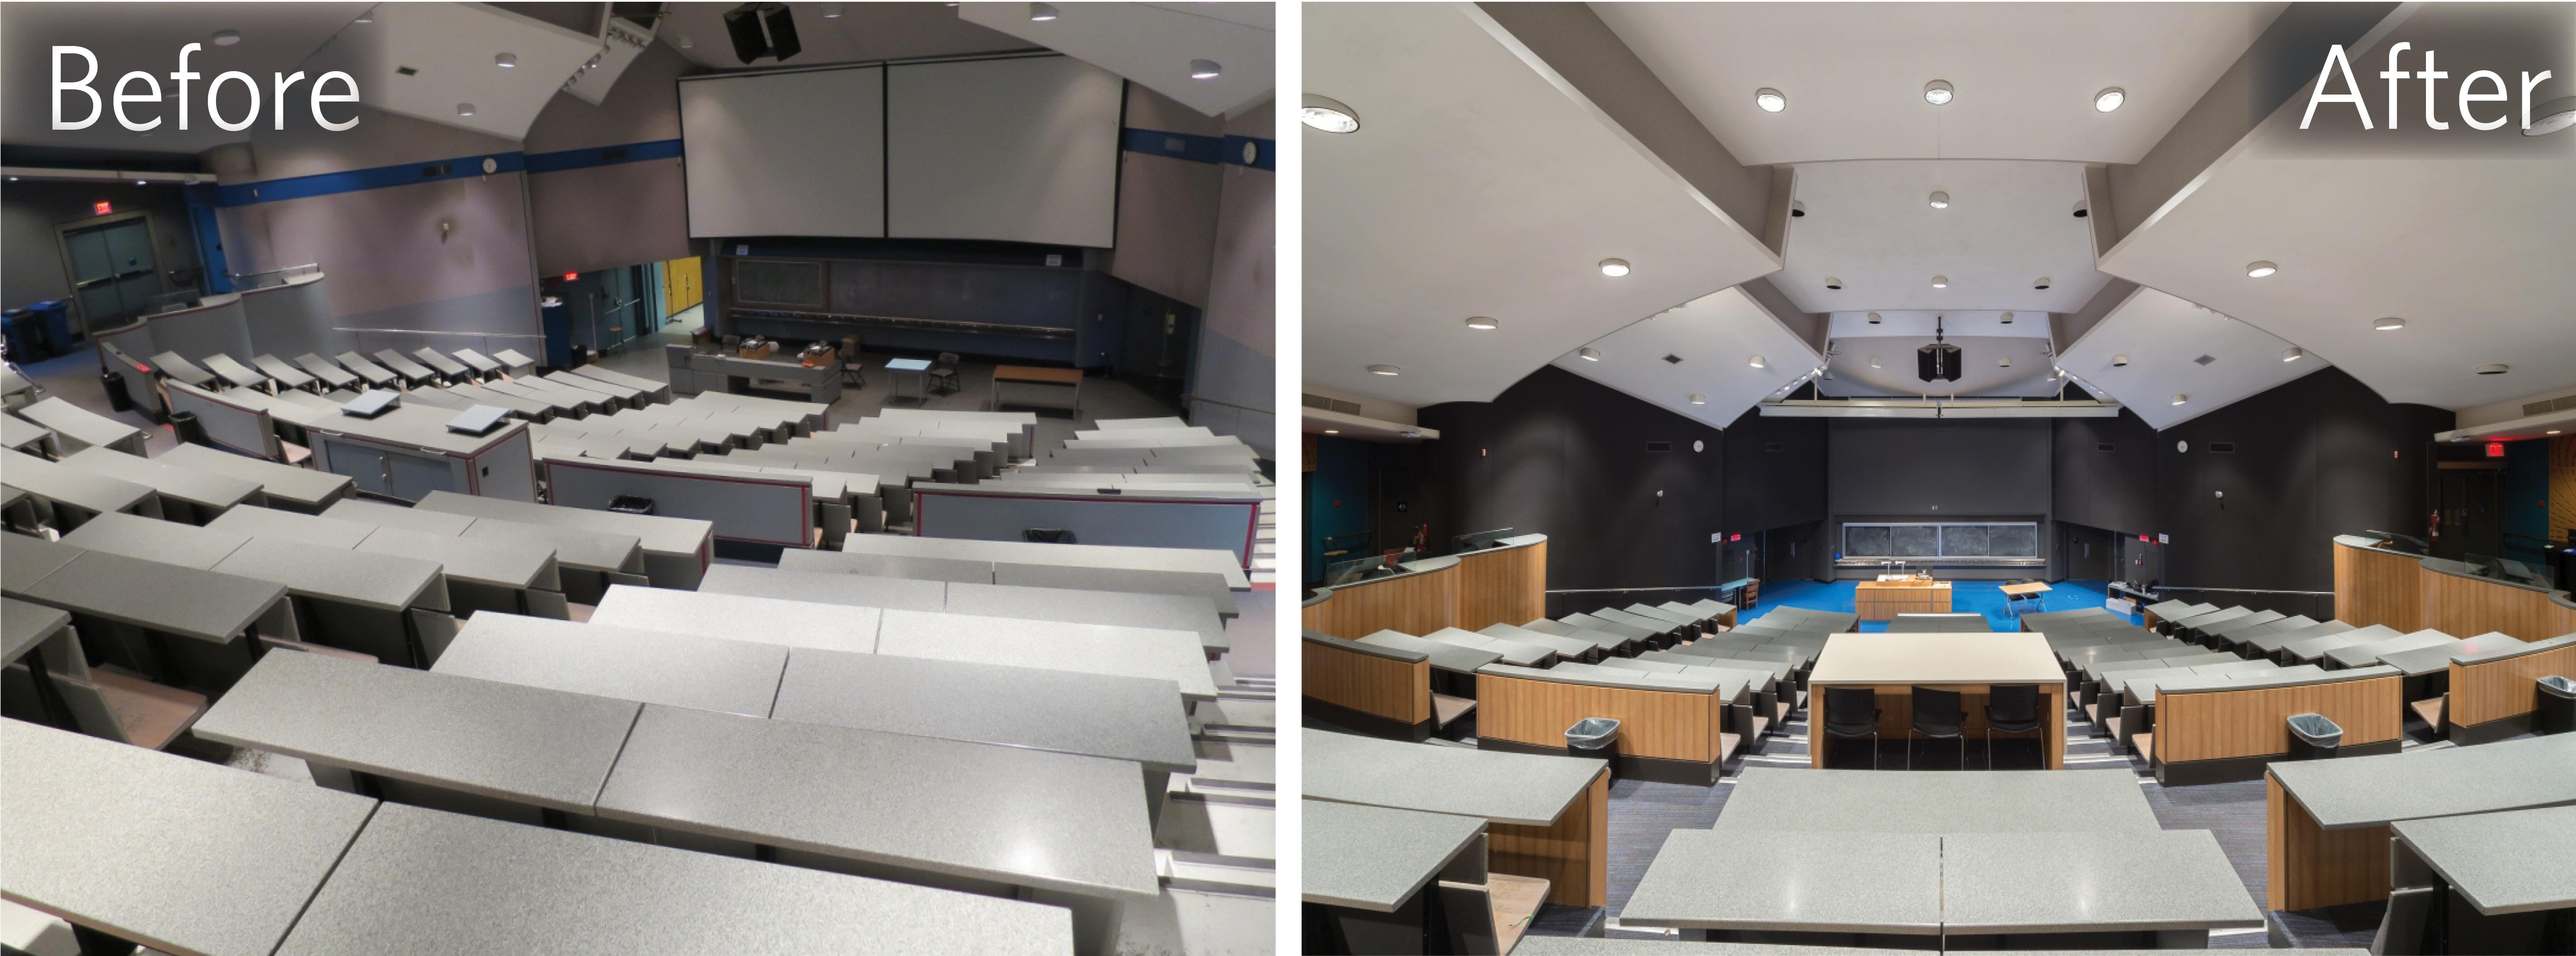 - HEBB 100 seismic upgrade and theatre modernization